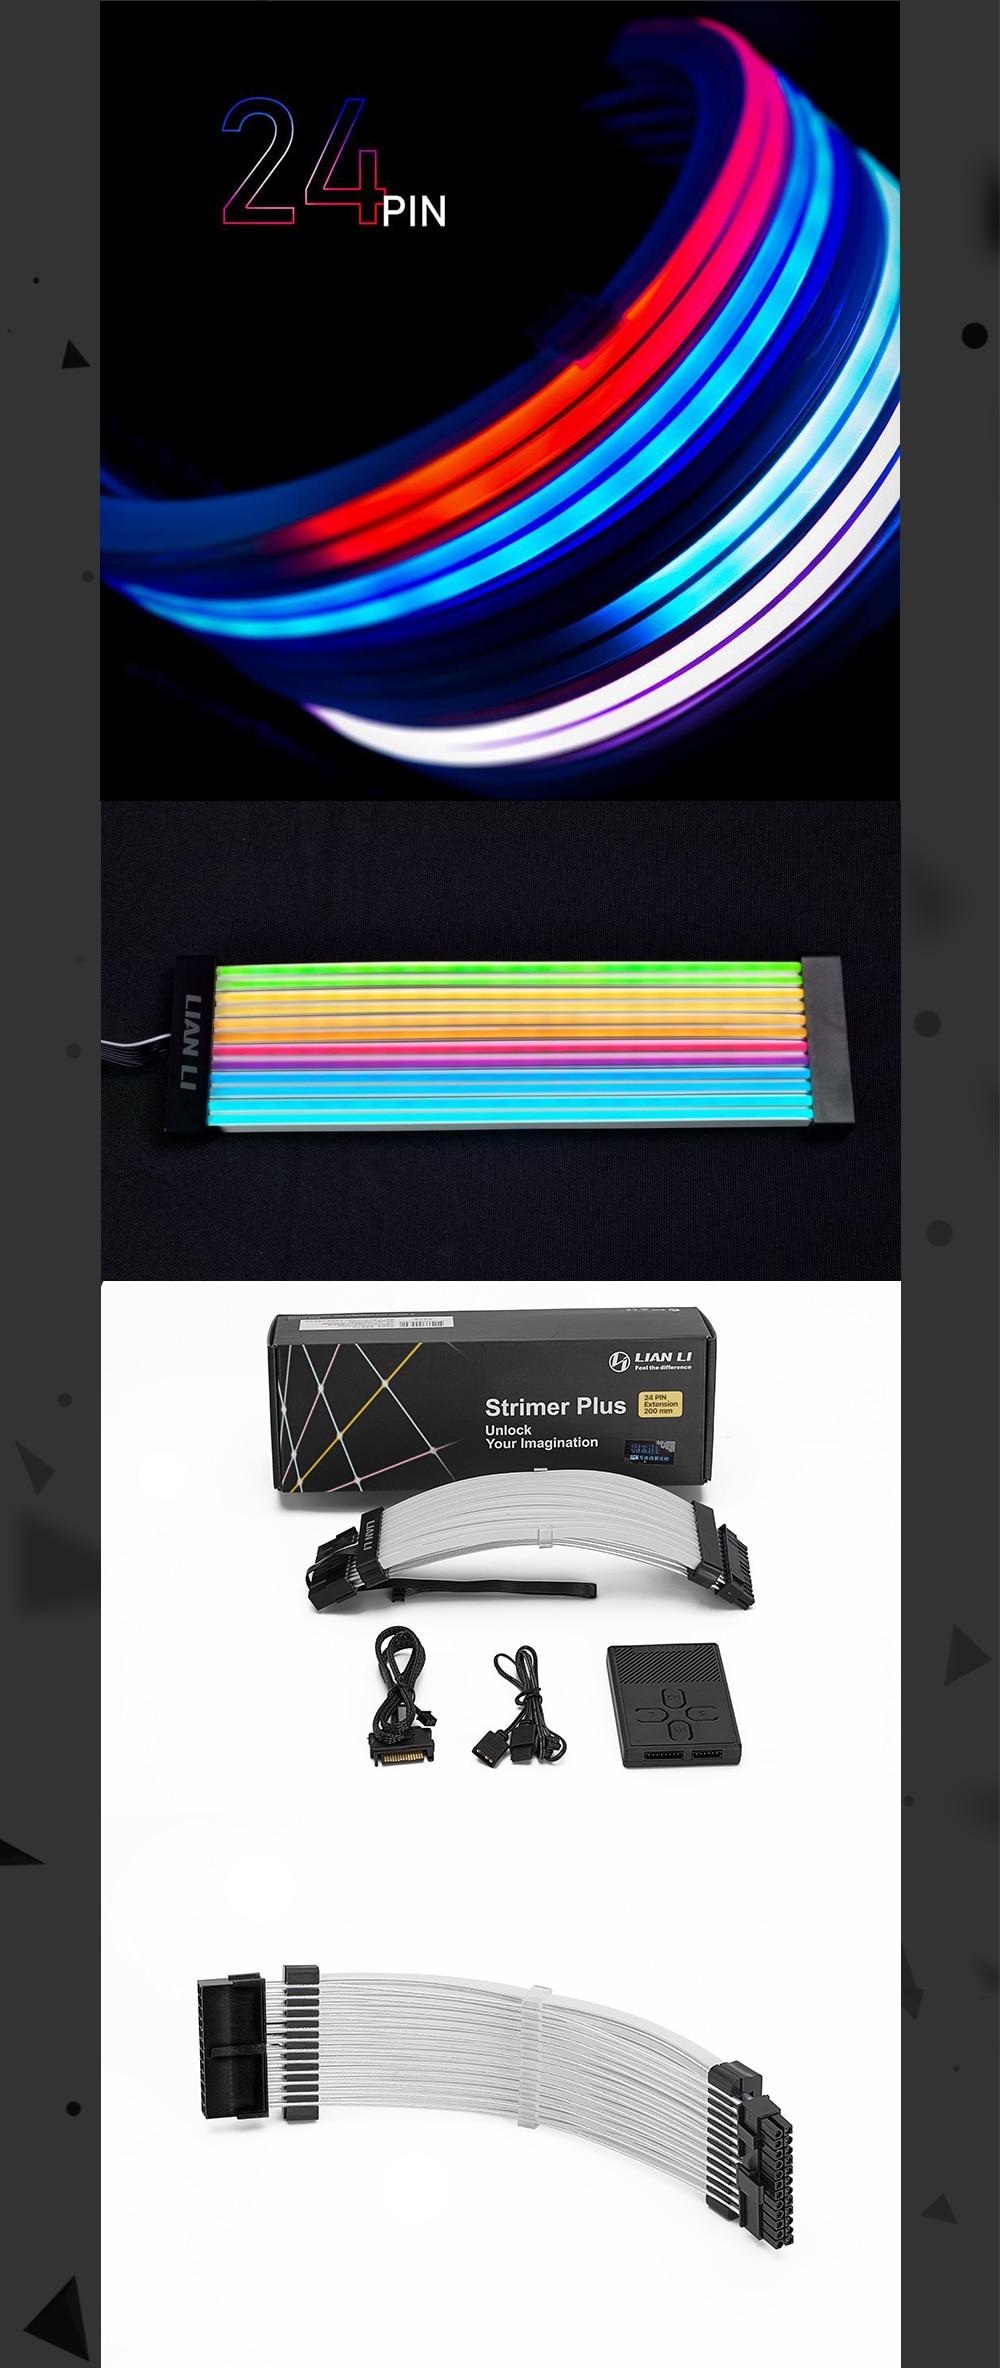 Extension Cable Kit Lian Li Strimer Plus Rgb Pc Addressable 5v A-Rgb cable for Motherboard Atx 24pin PCI-E Gpu 8pin